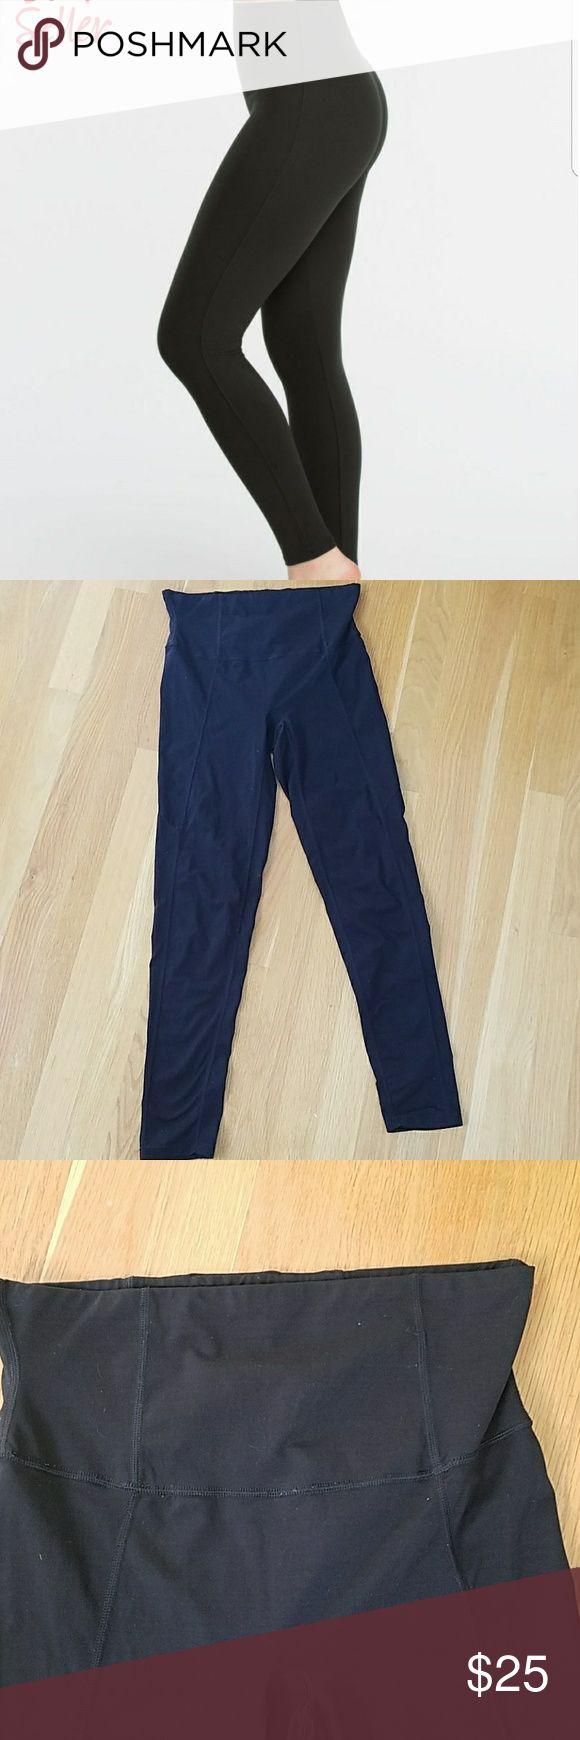 Spanx leggings size large EUC spanx Pants Leggings